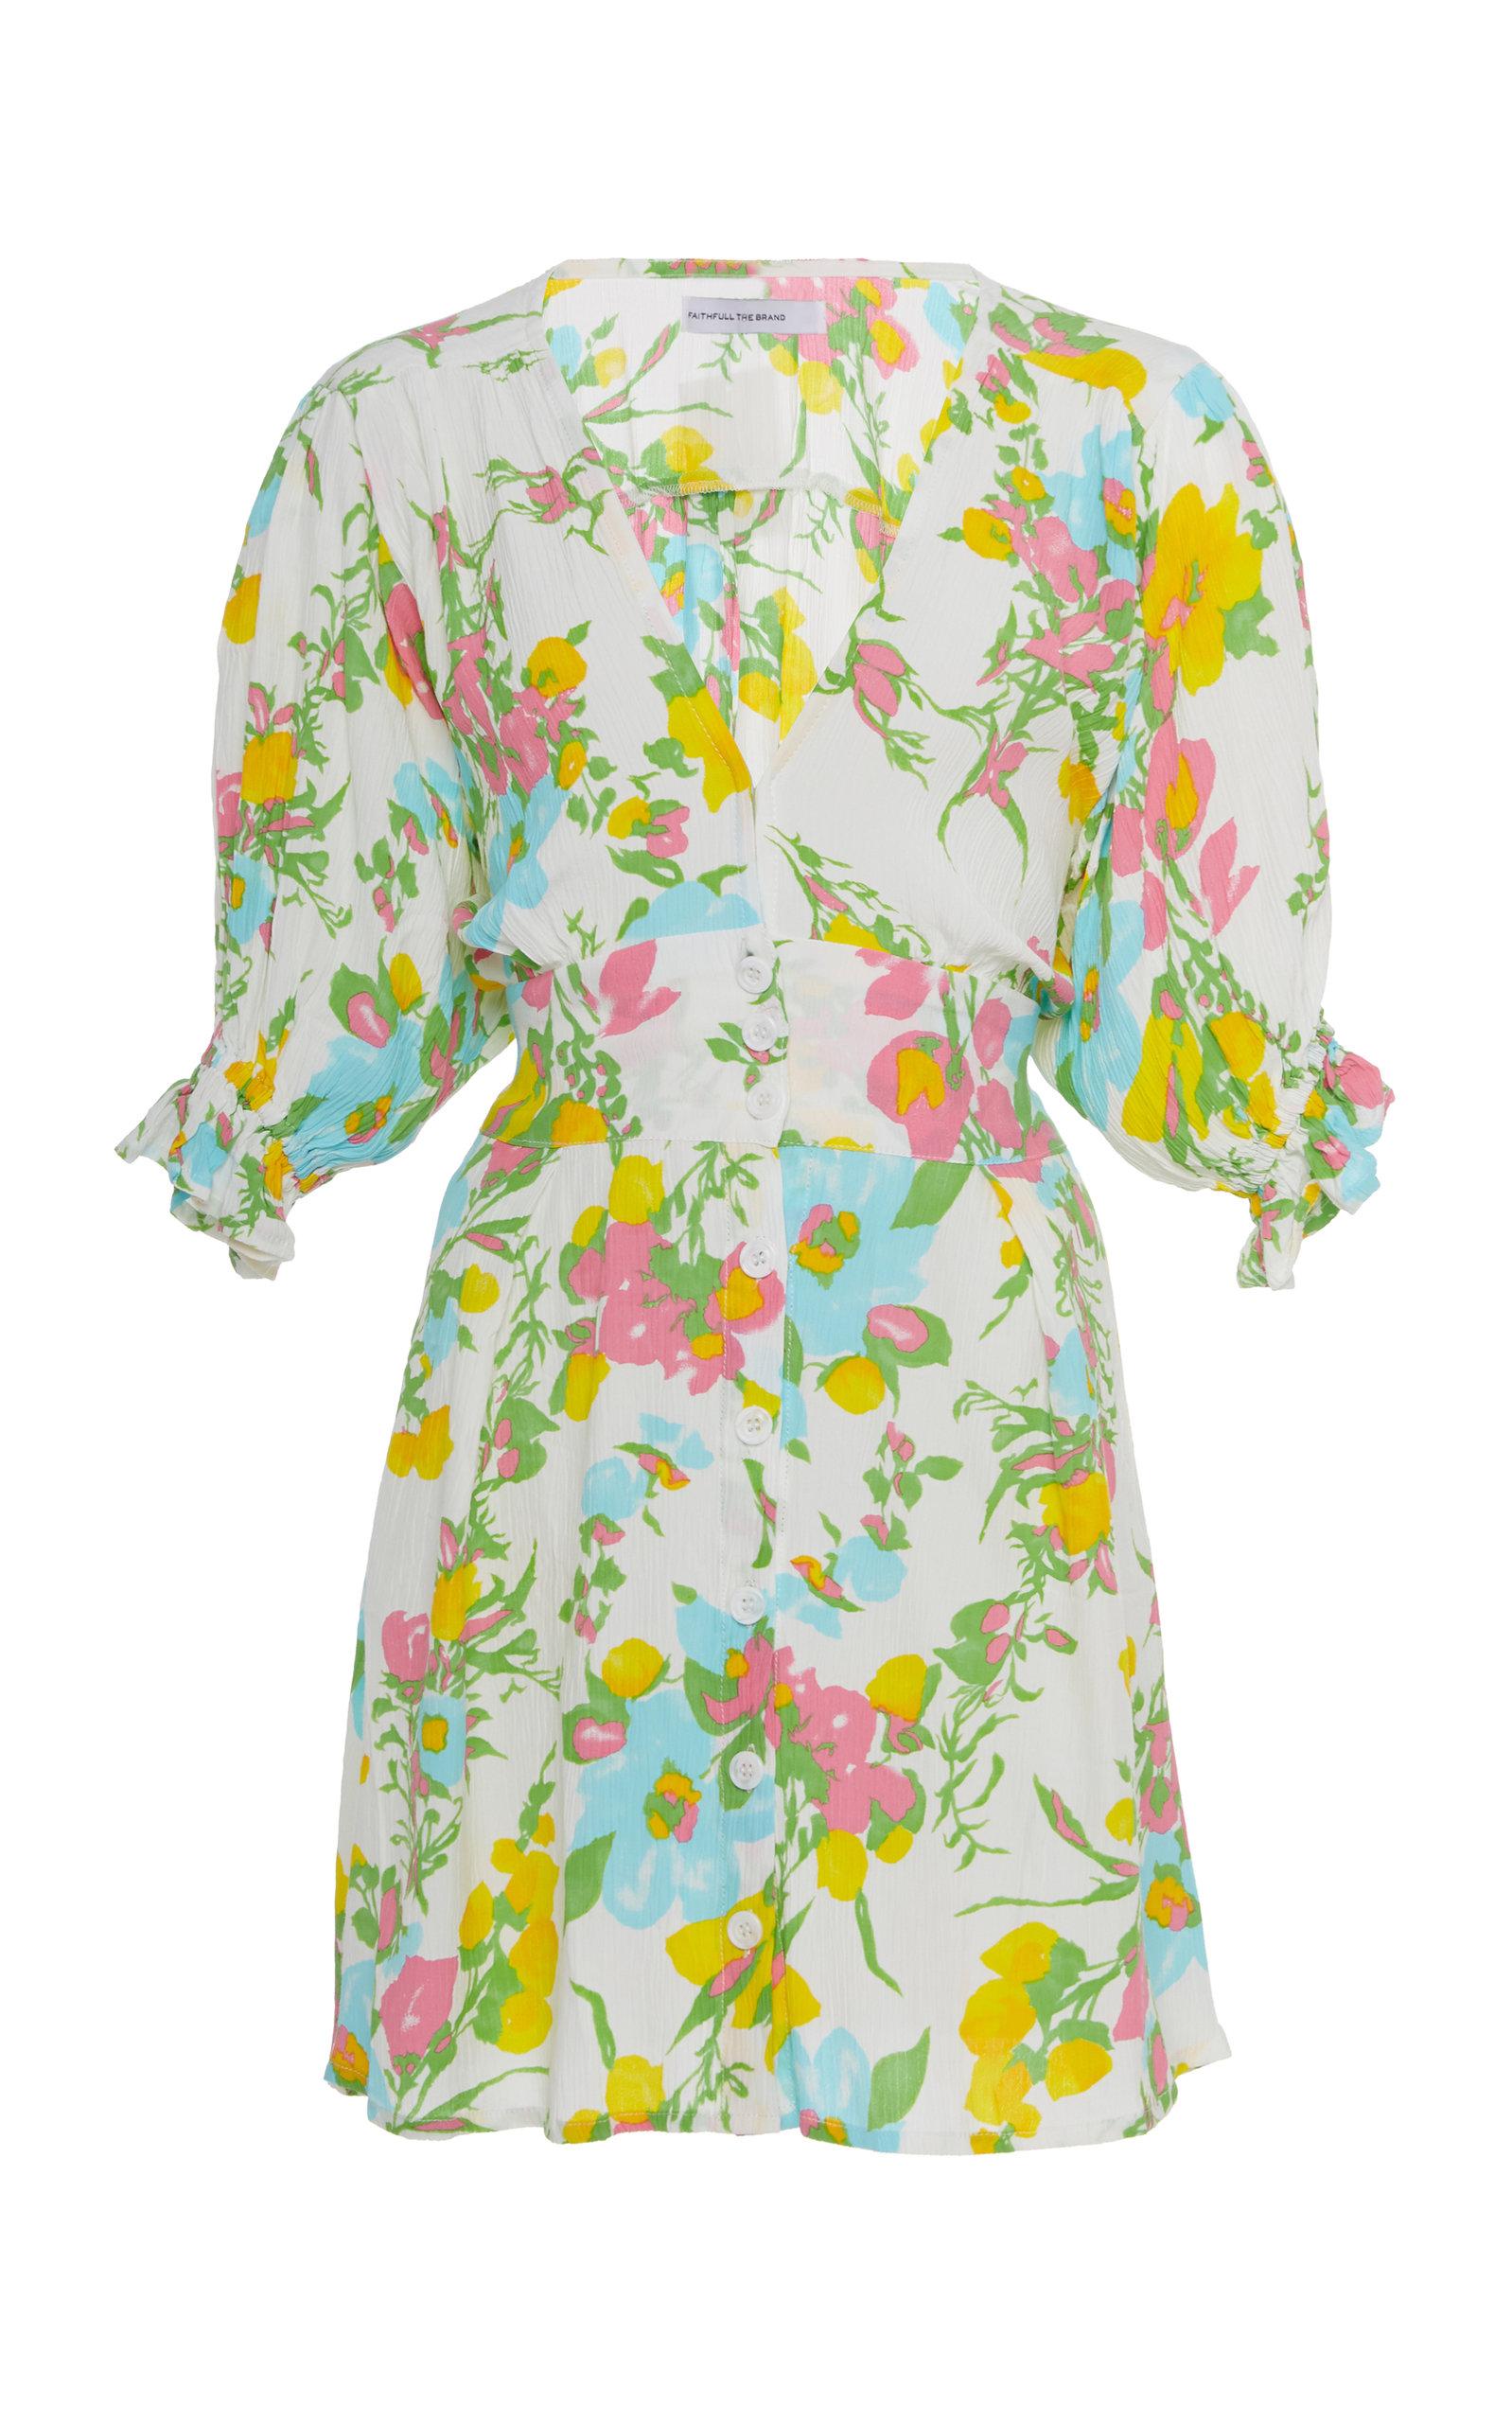 Buy Faithfull The Brand Caliente Floral Mini Dress online, shop Faithfull The Brand at the best price